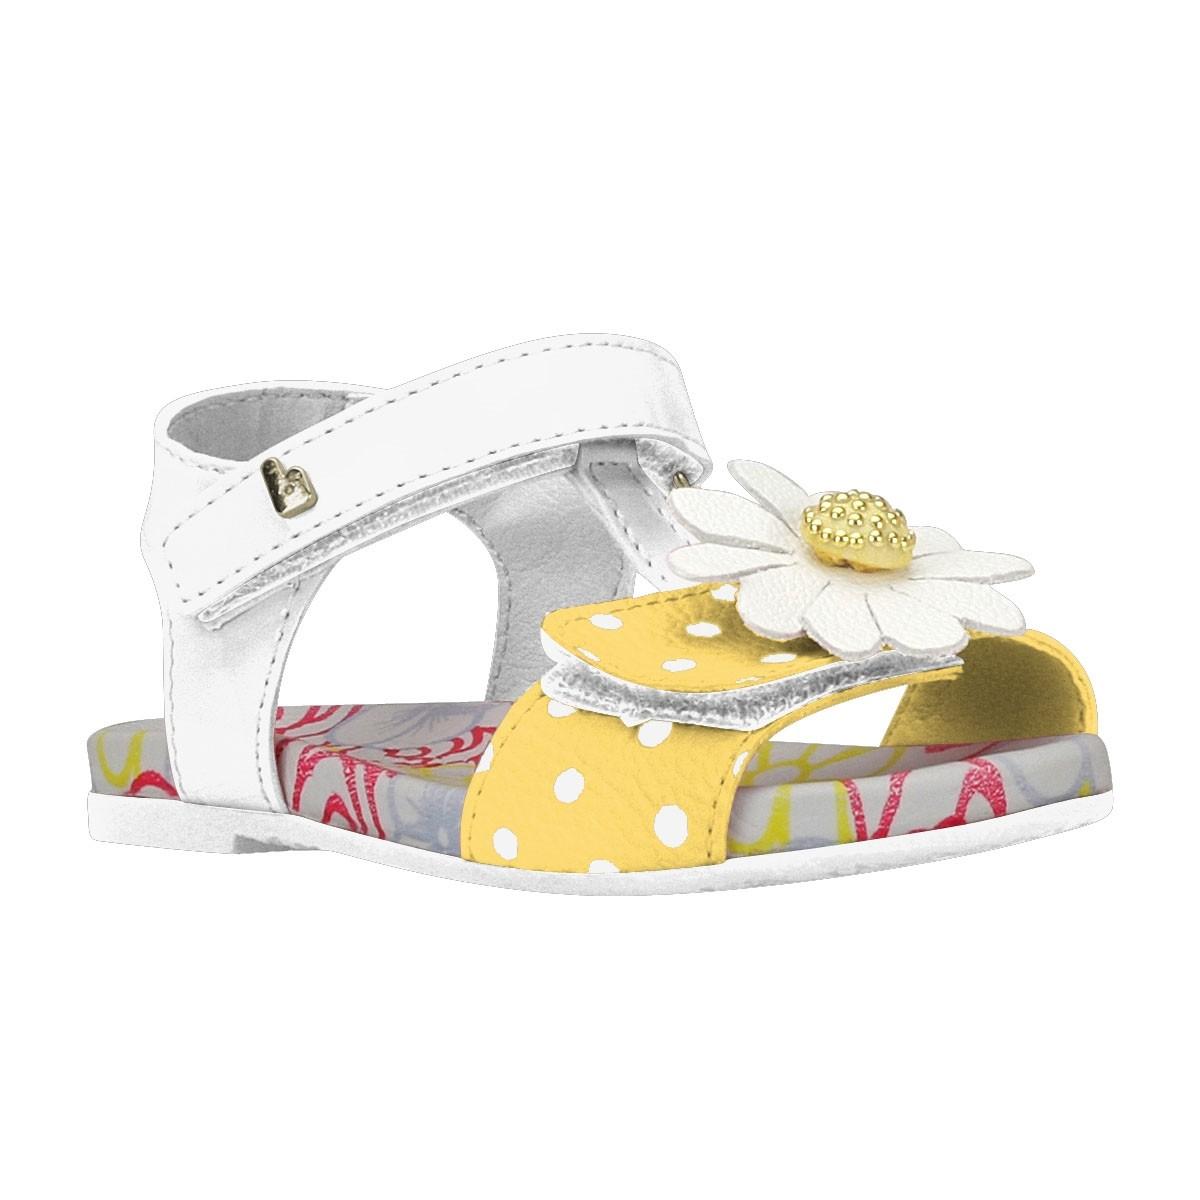 08ce2246f6 Bizz Store - Sandália Infantil Feminina Bibi Baby Birk III